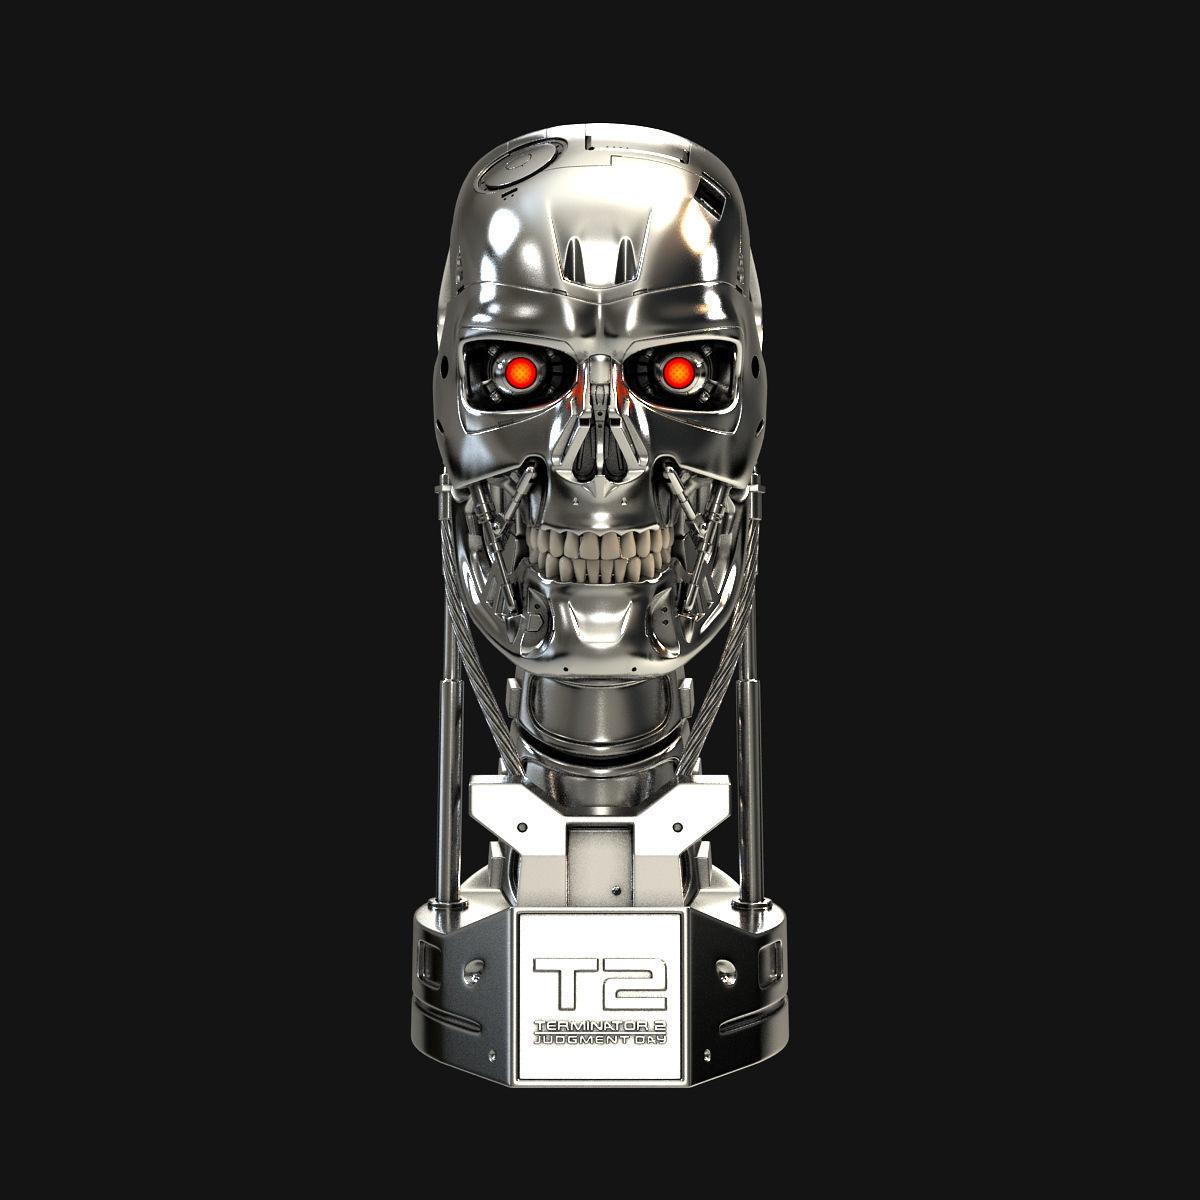 terminator-t-800-skull-bust-v2-3d-model-obj-stl.jpg